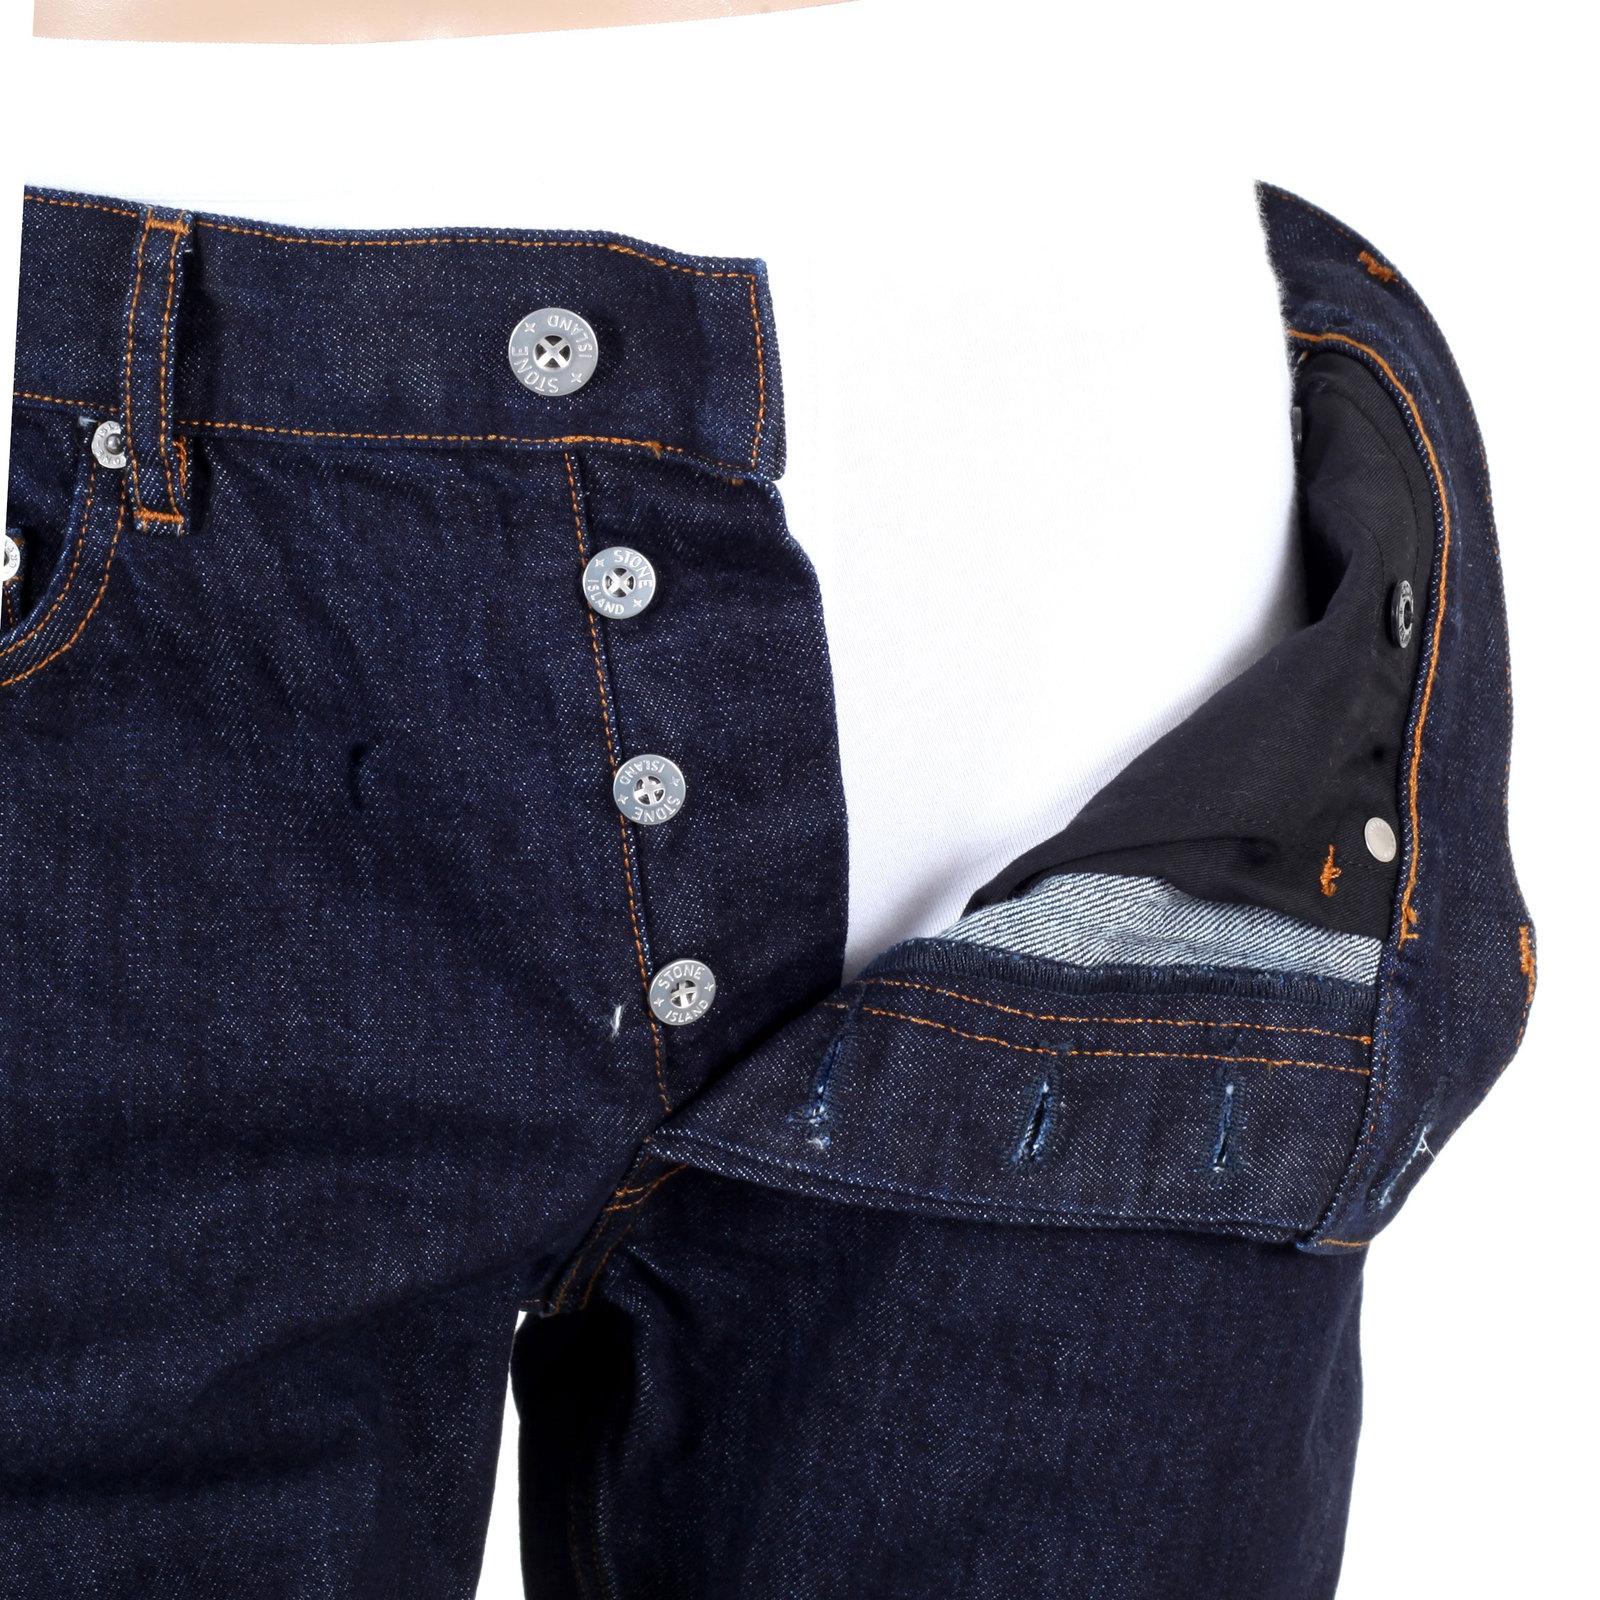 Stylish Dark Wash Stone Island Denim Jeans for Men